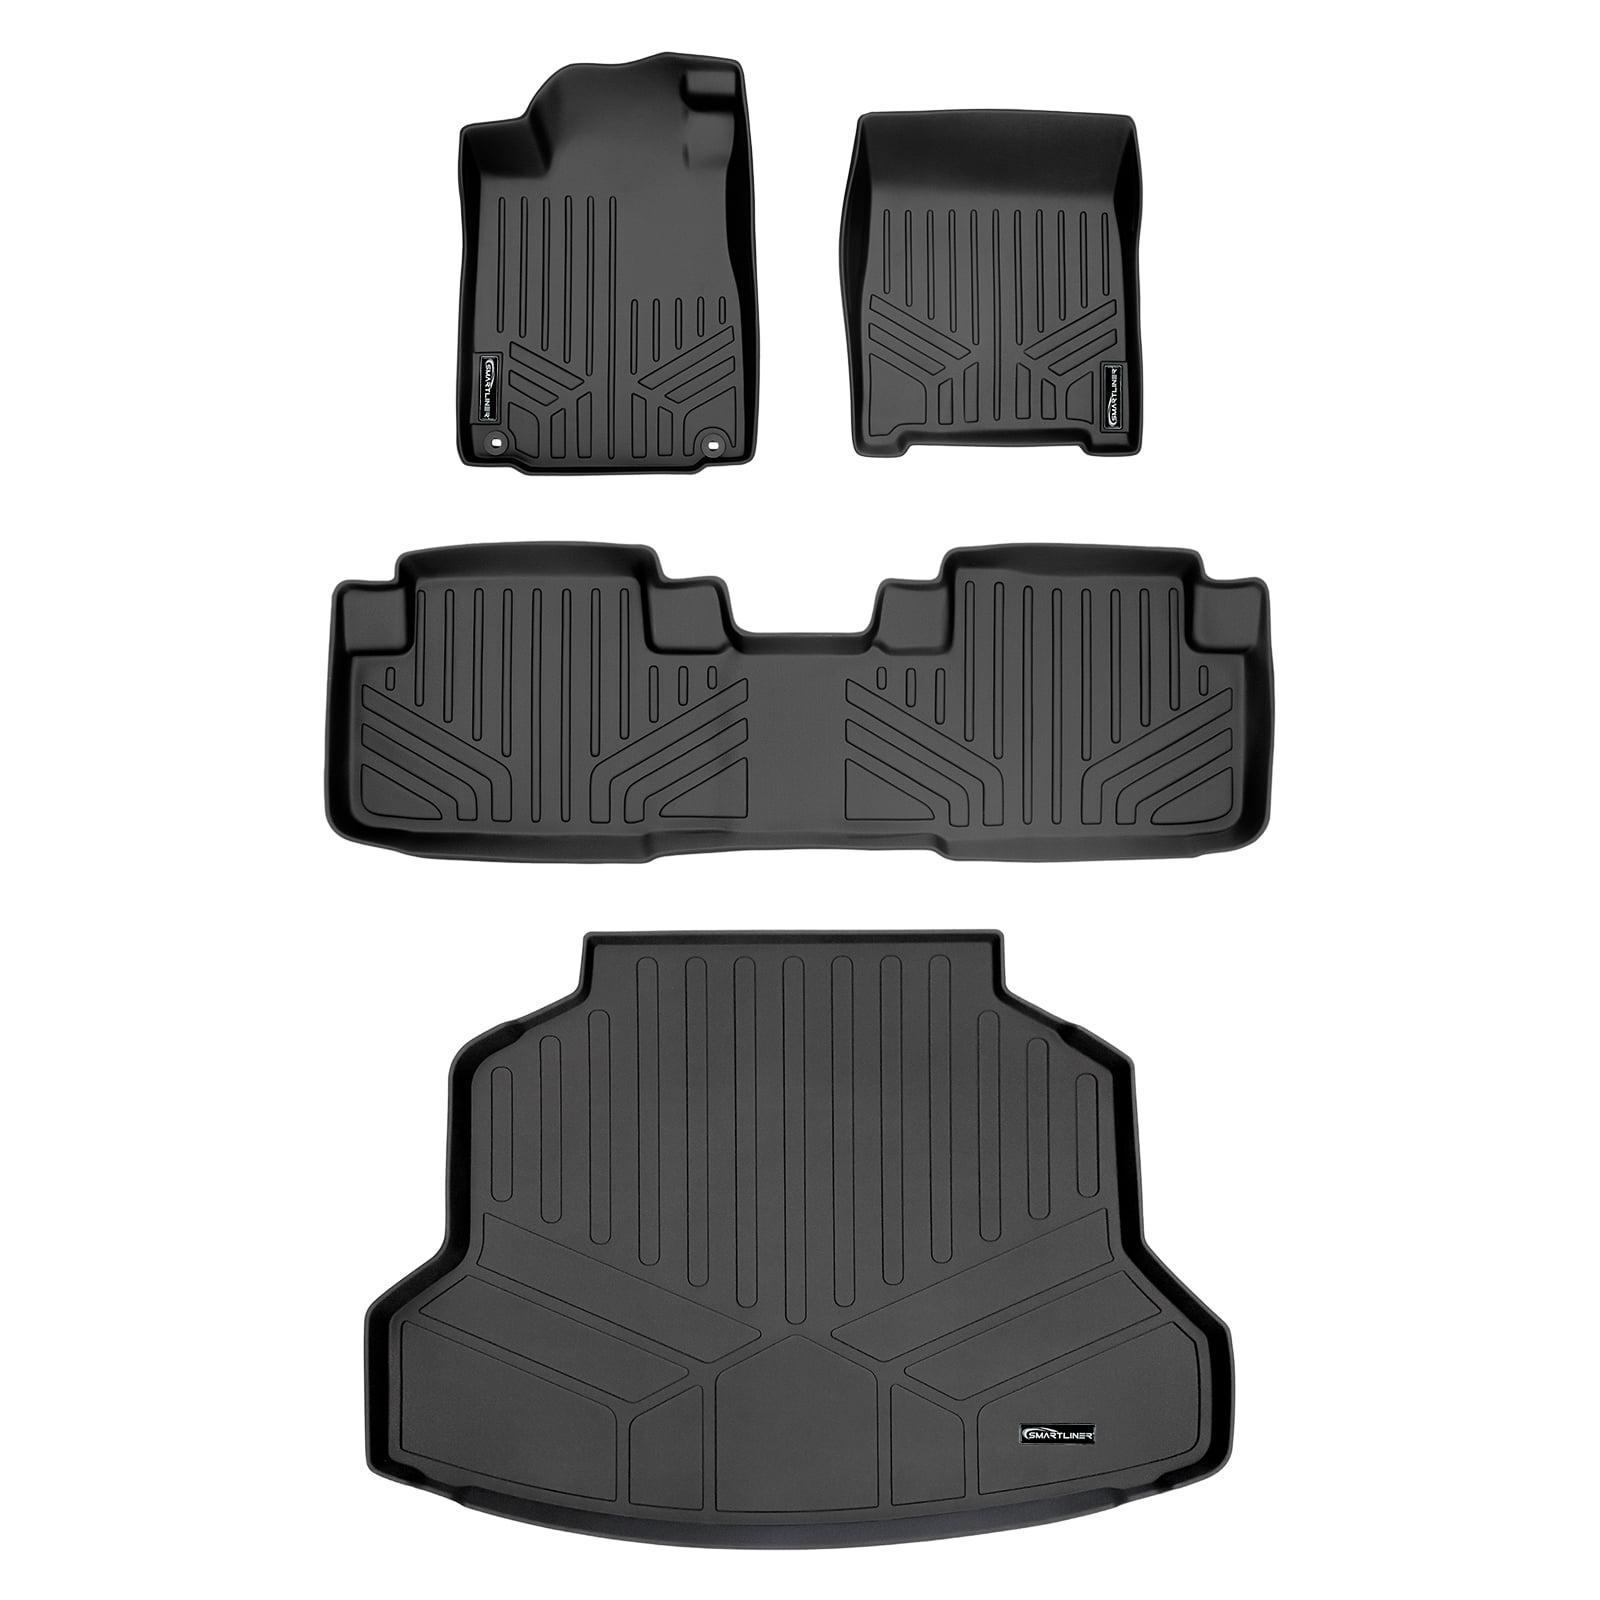 BLACK 1 Piece Trim to Fit Odorless Premium Cargo Trunk Mat for HONDA CRV